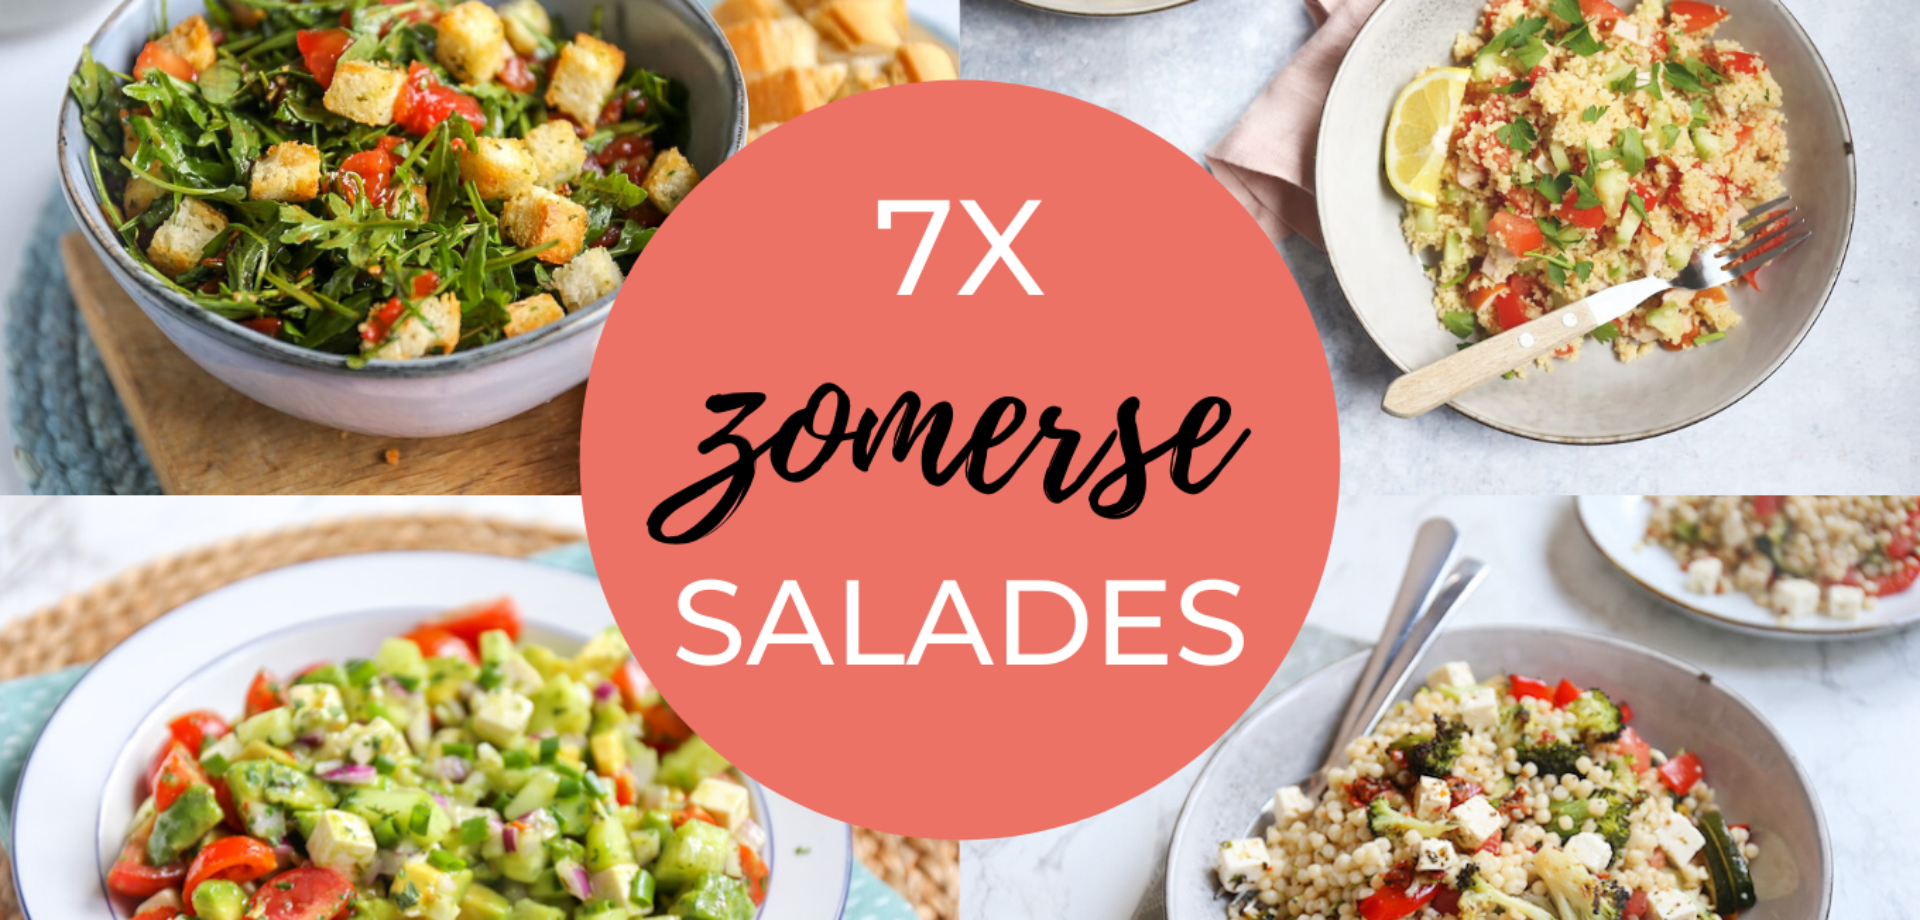 7x zomerse salades